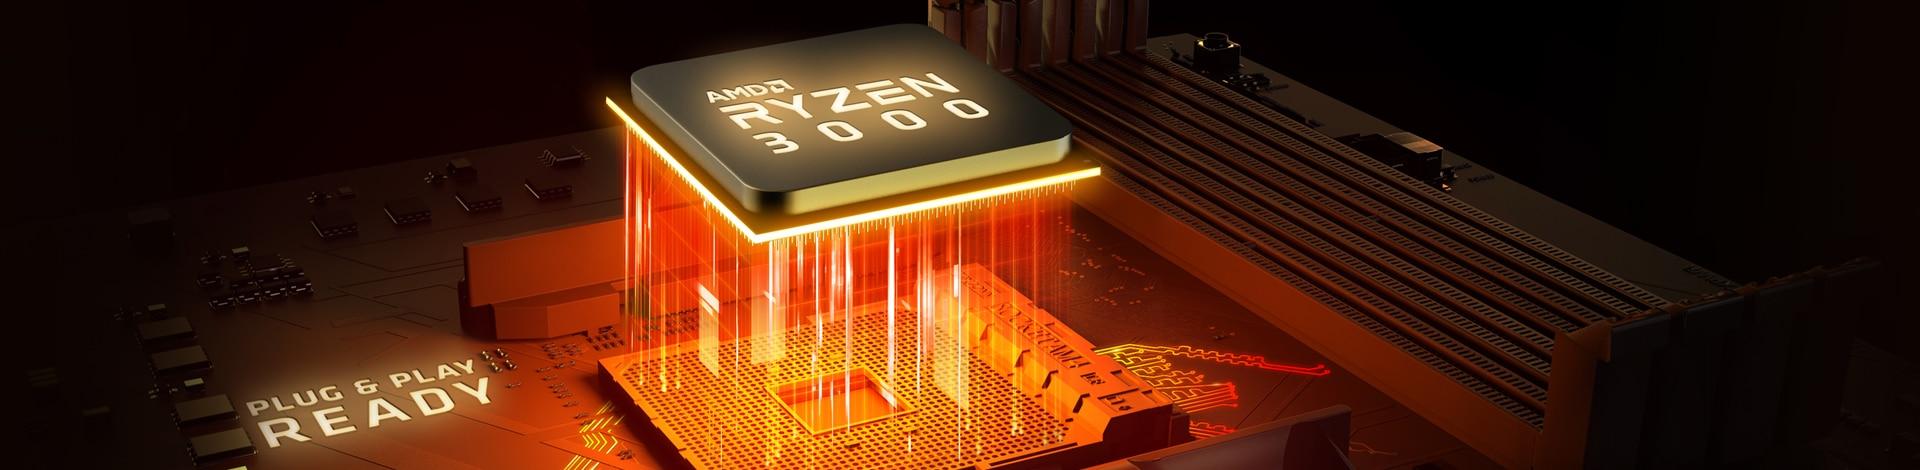 238593computex-ryzen-3000-series-chip-badge1920x500_1